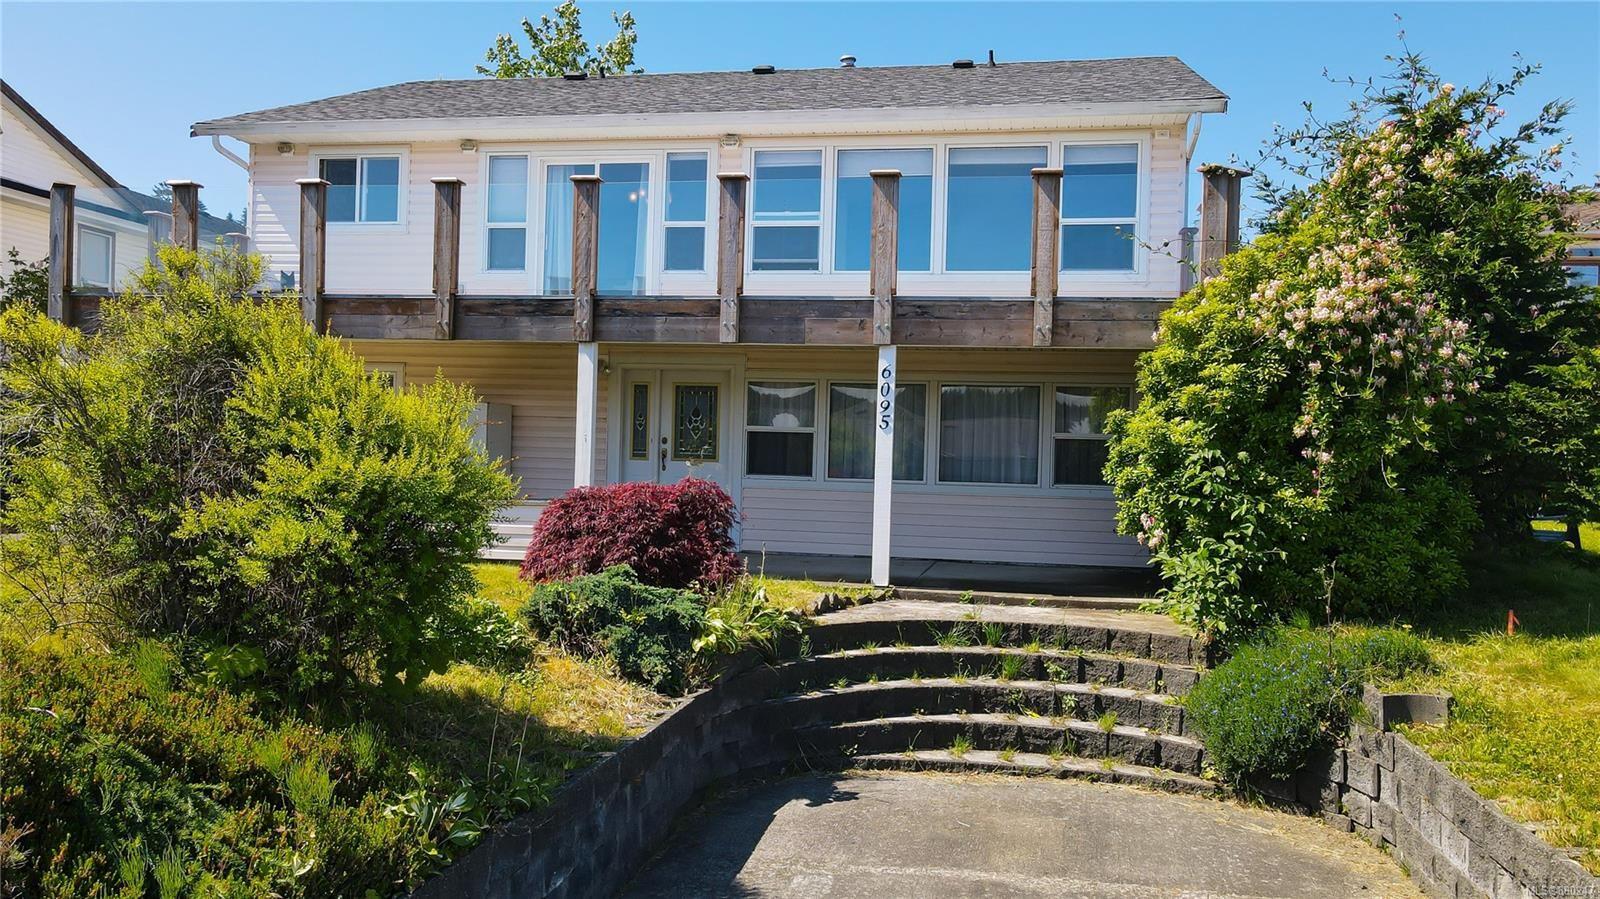 Main Photo: 6095 Hunt St in : NI Port Hardy House for sale (North Island)  : MLS®# 880247